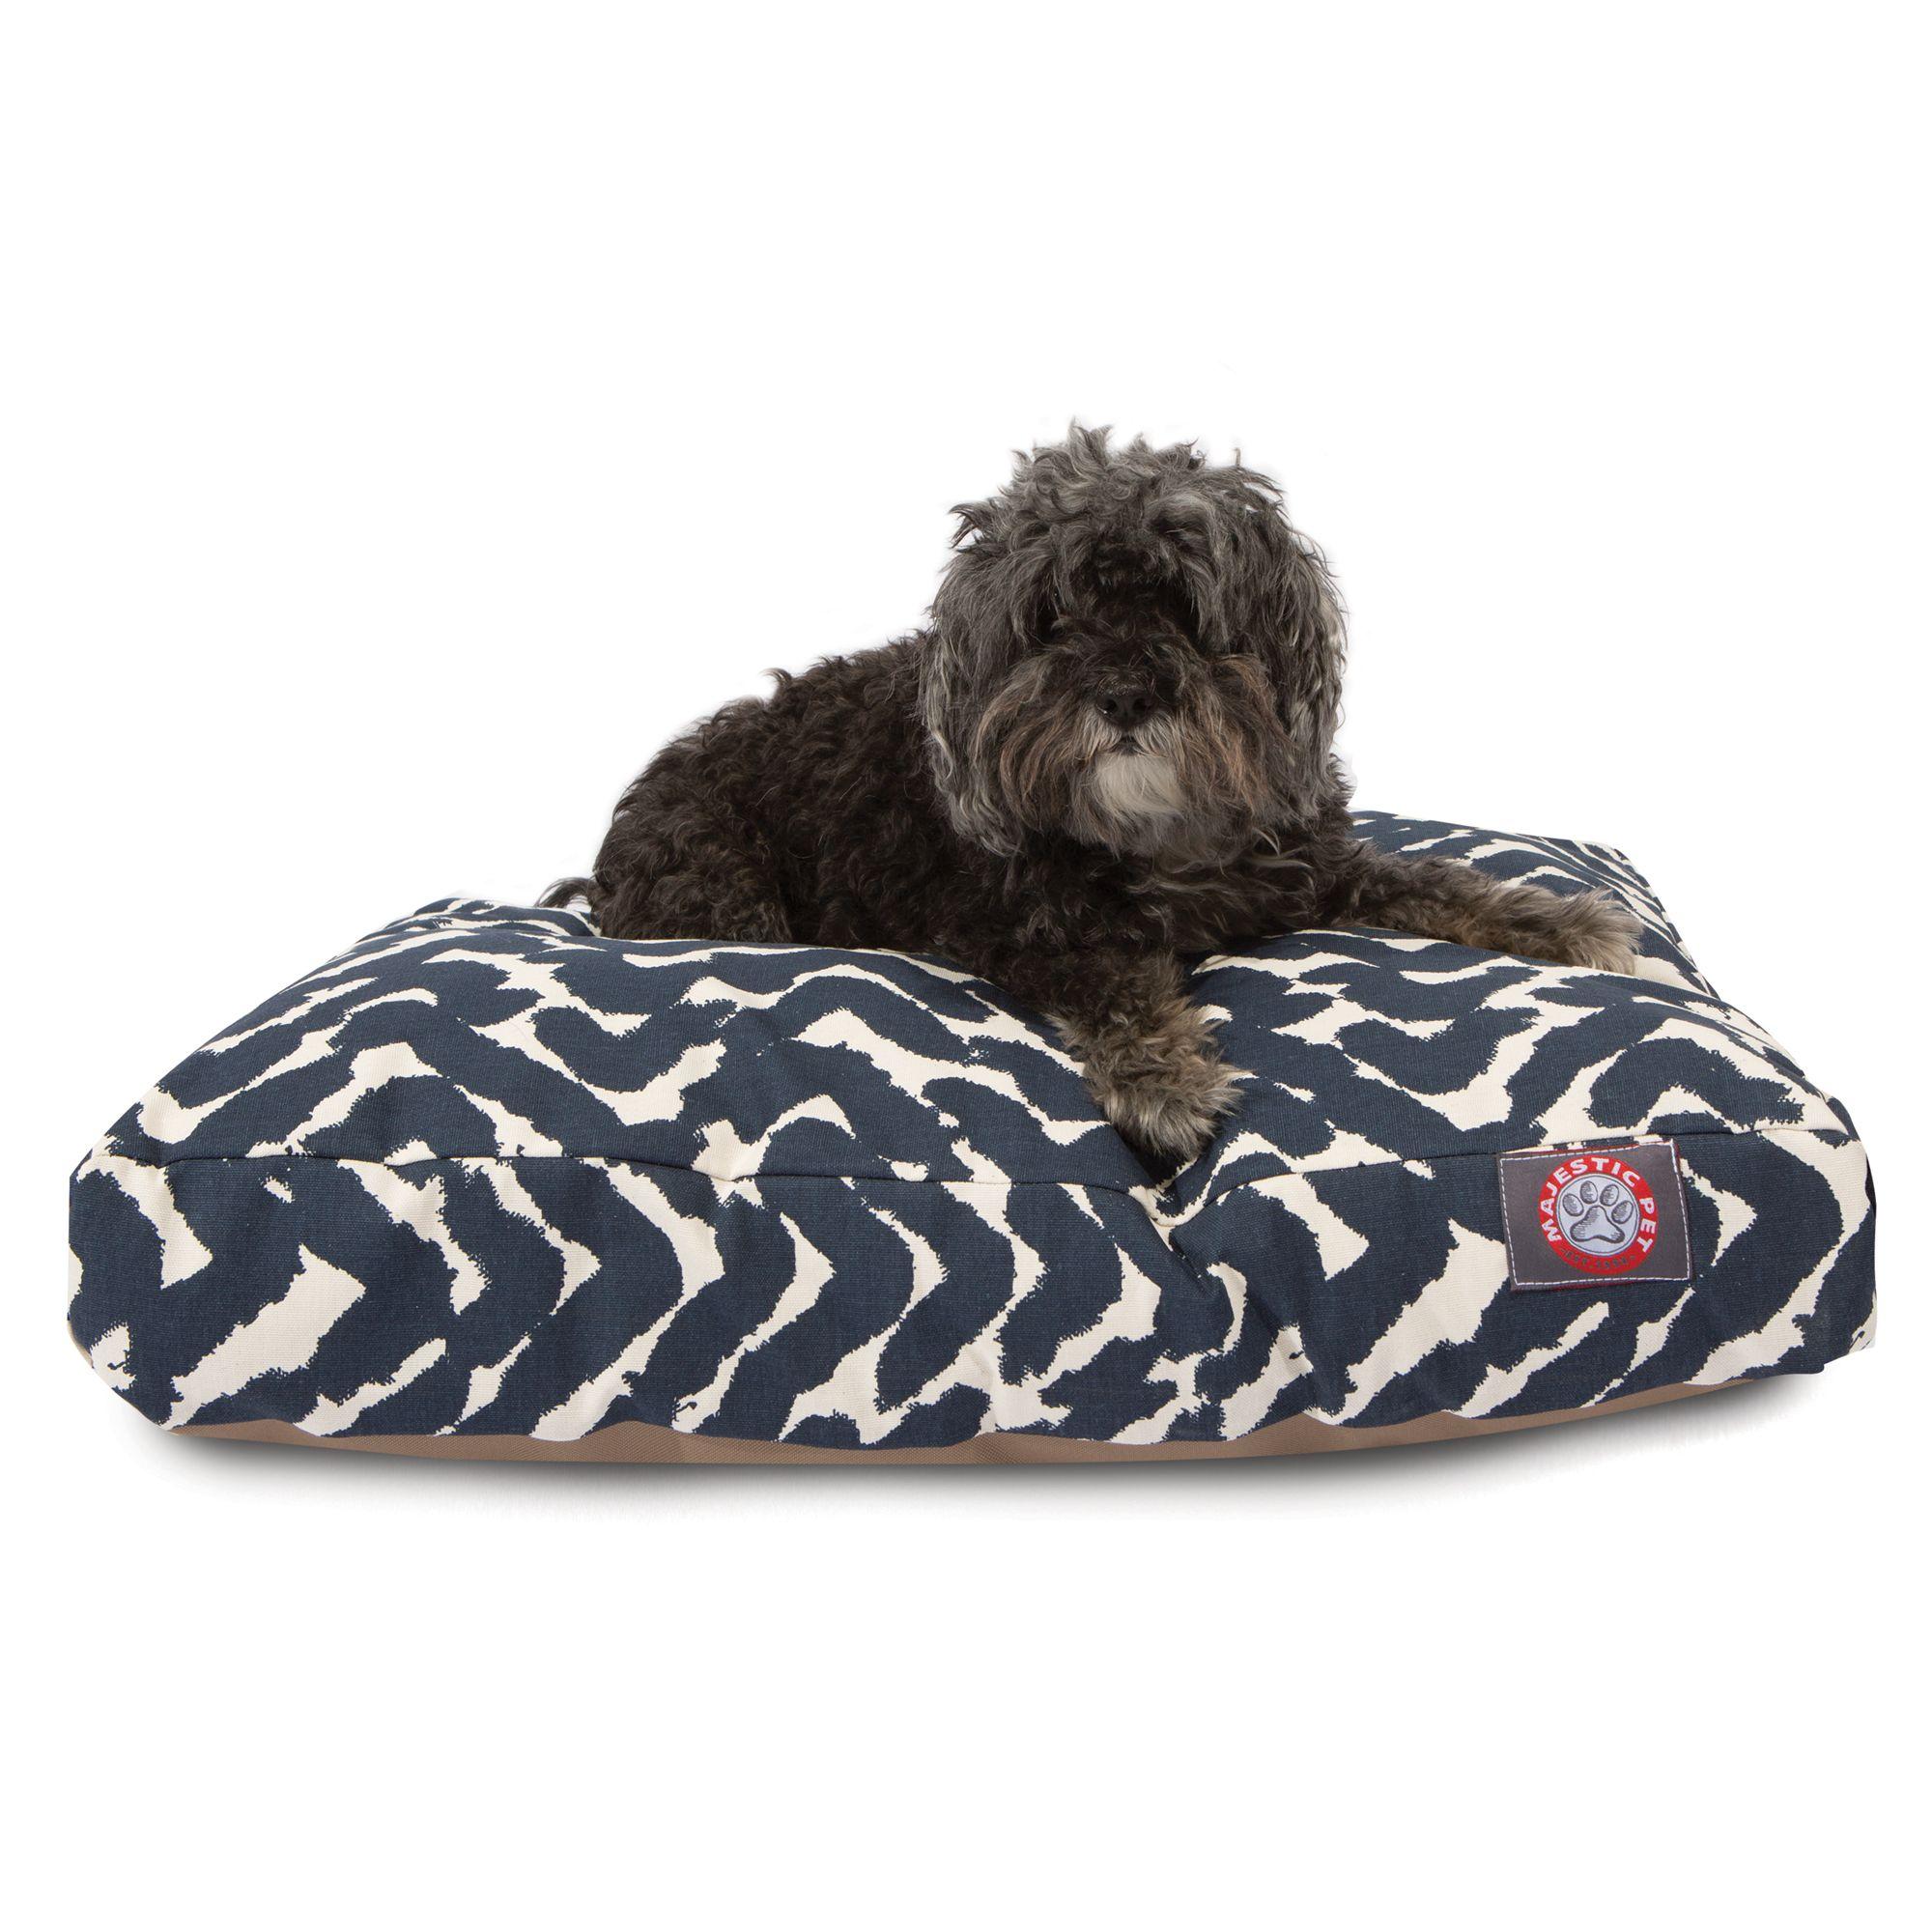 Enjoyable Majestic Pet Brushstrokes Navy Dog Bed Creativecarmelina Interior Chair Design Creativecarmelinacom